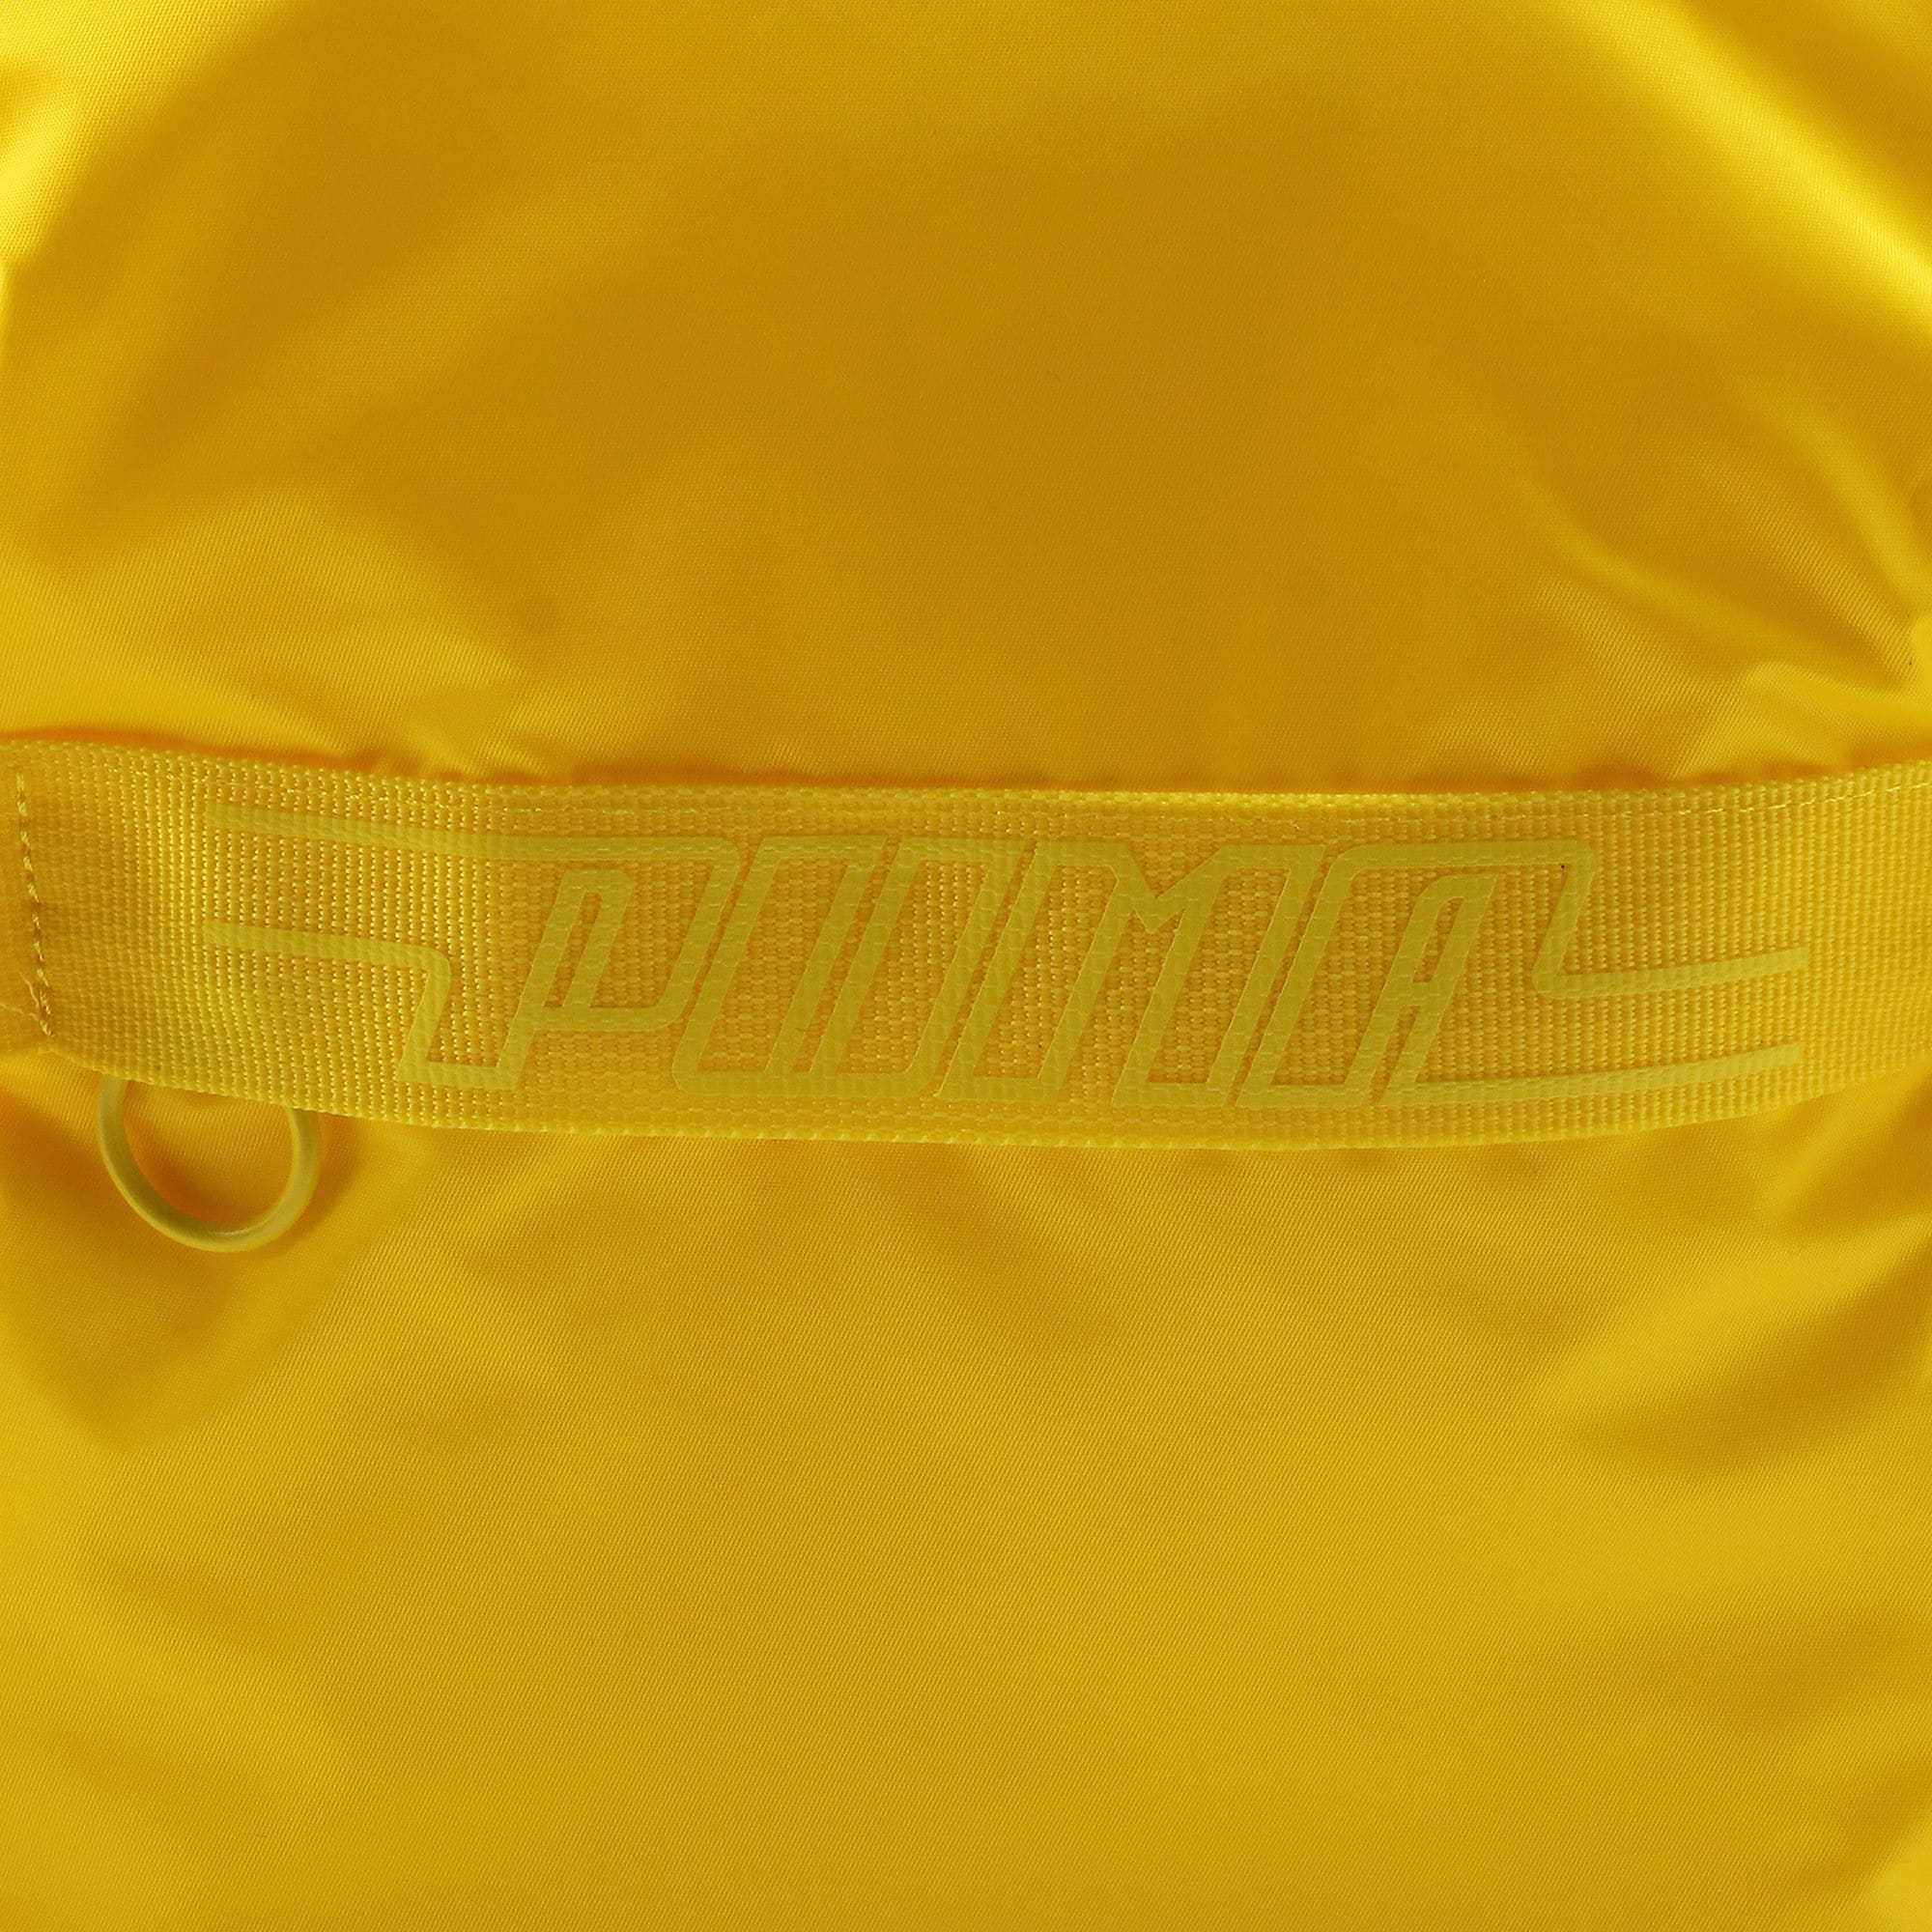 Thumbnail 5 of ウィメンズ コズミック バックパック 20L, Blazing Yellow, medium-JPN